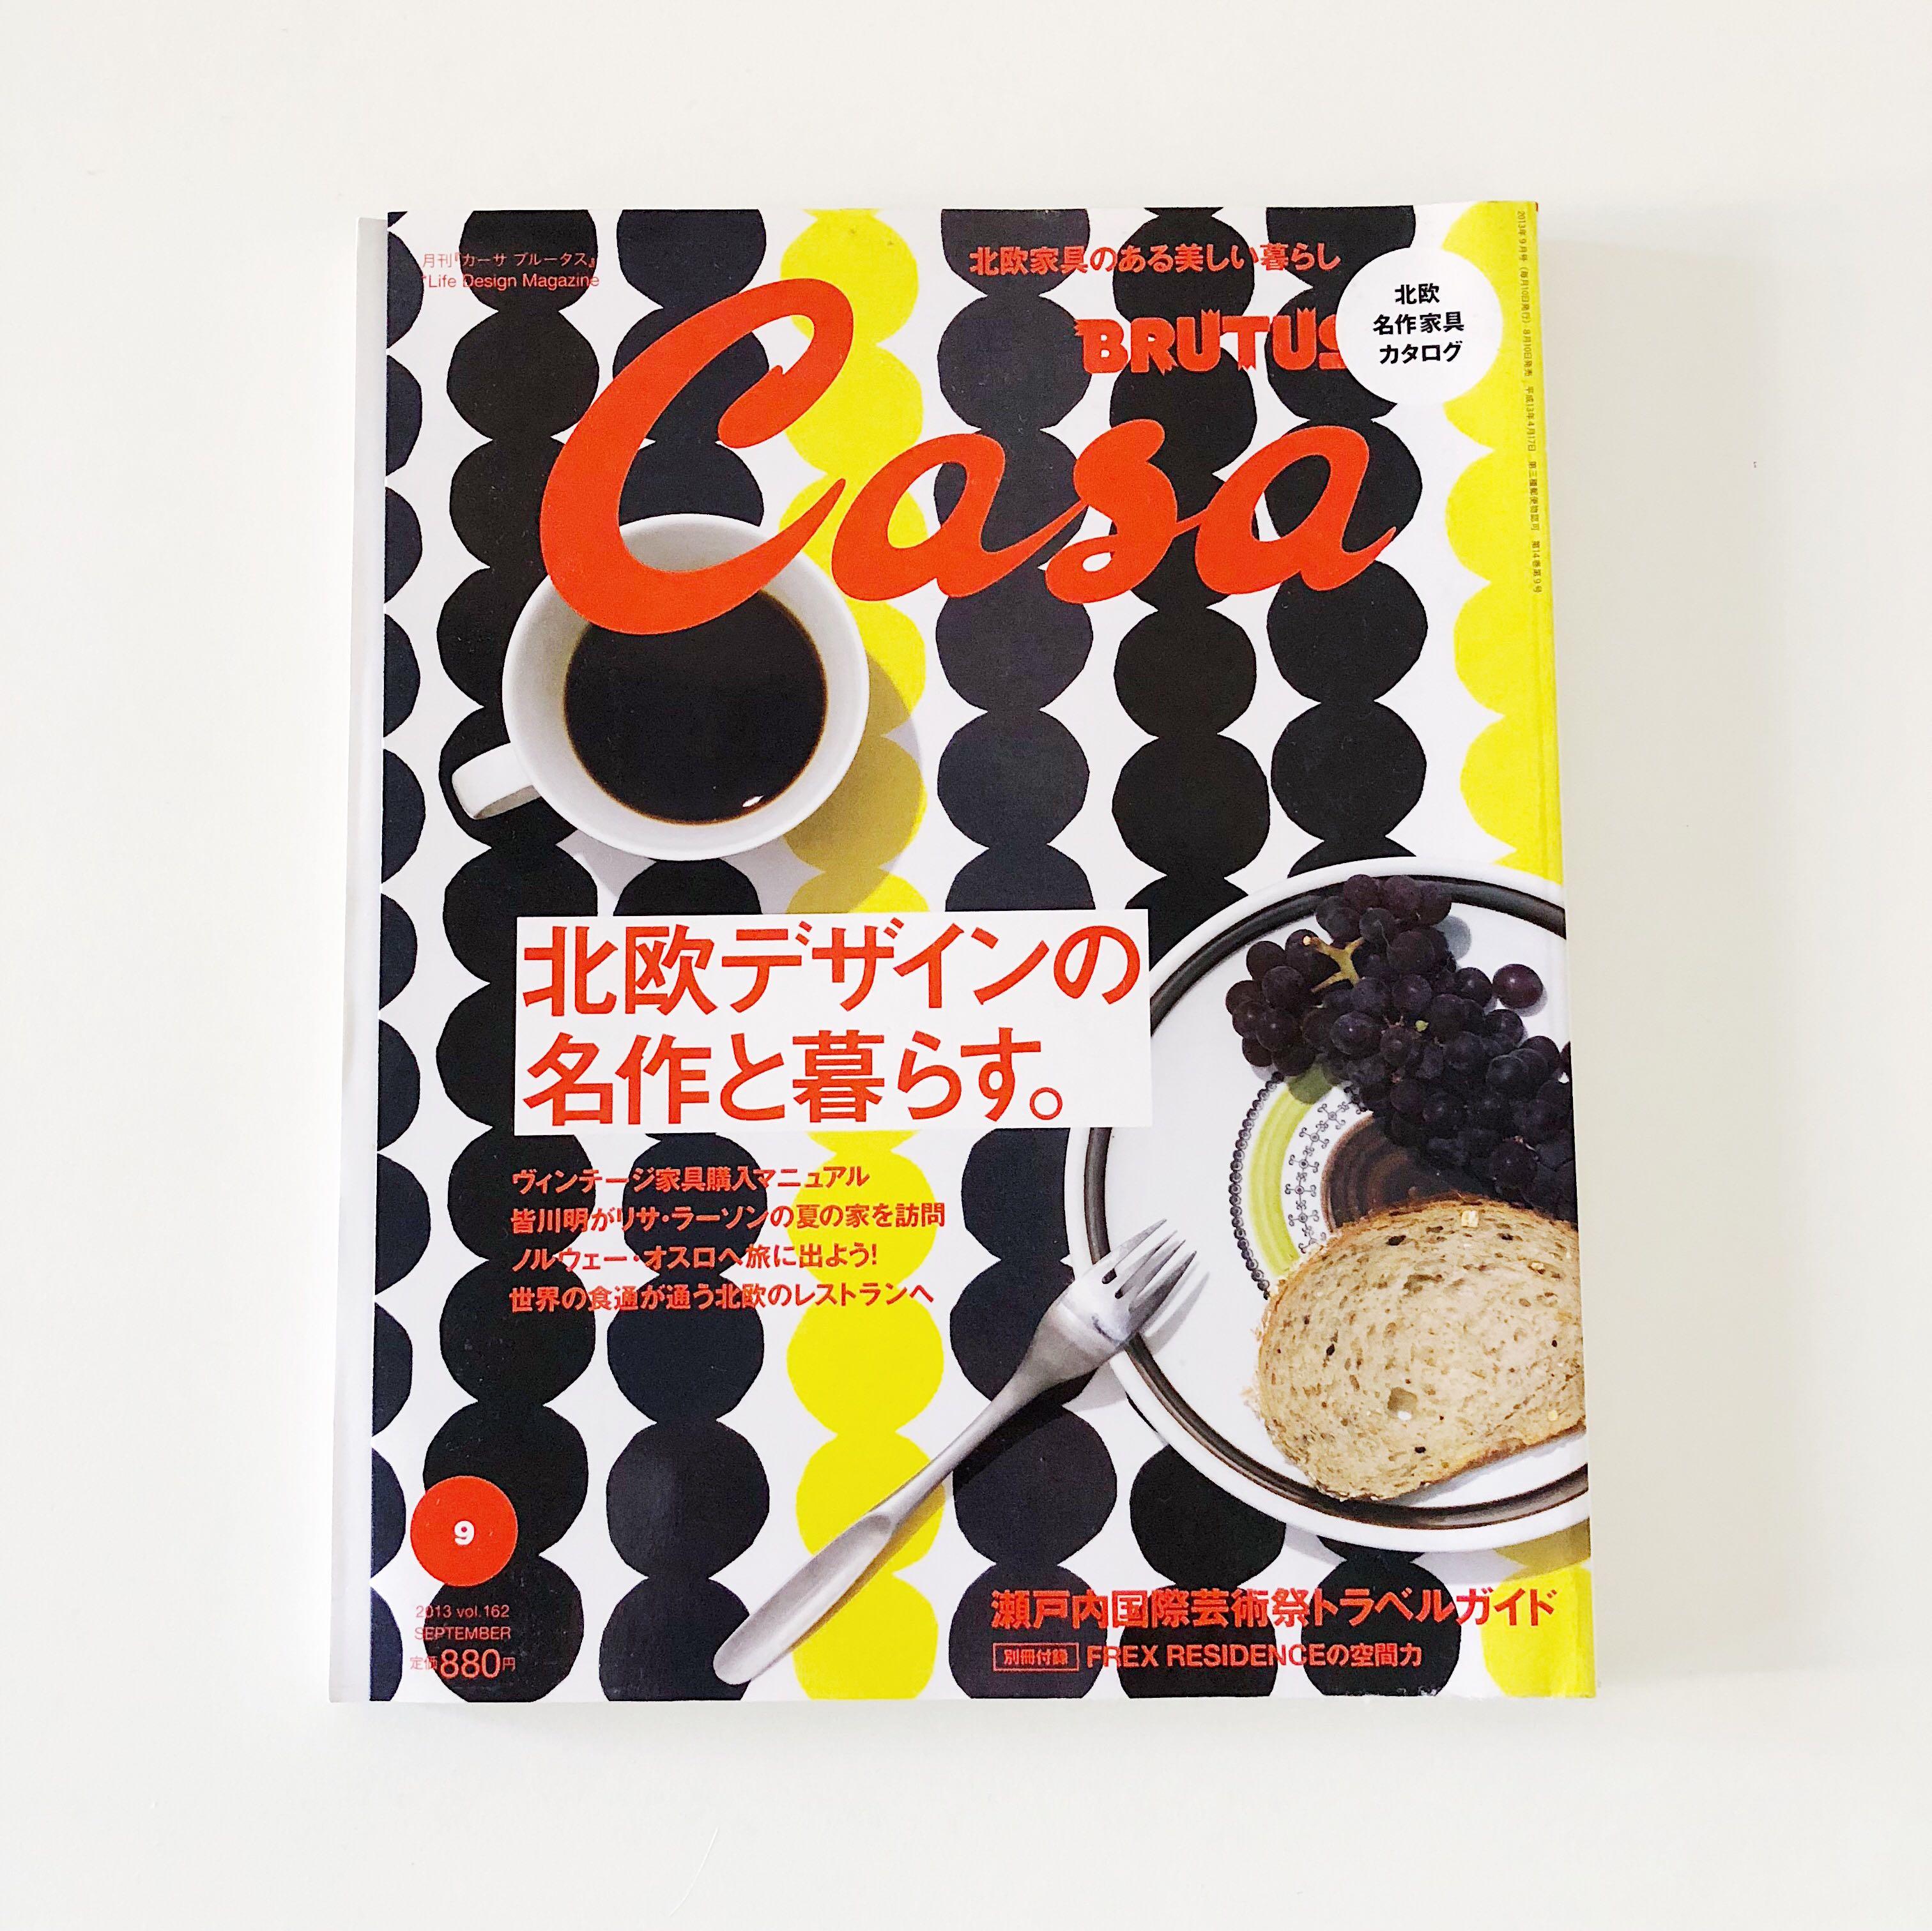 Casa Brutus On Scandinavian Design Books Stationery Magazines